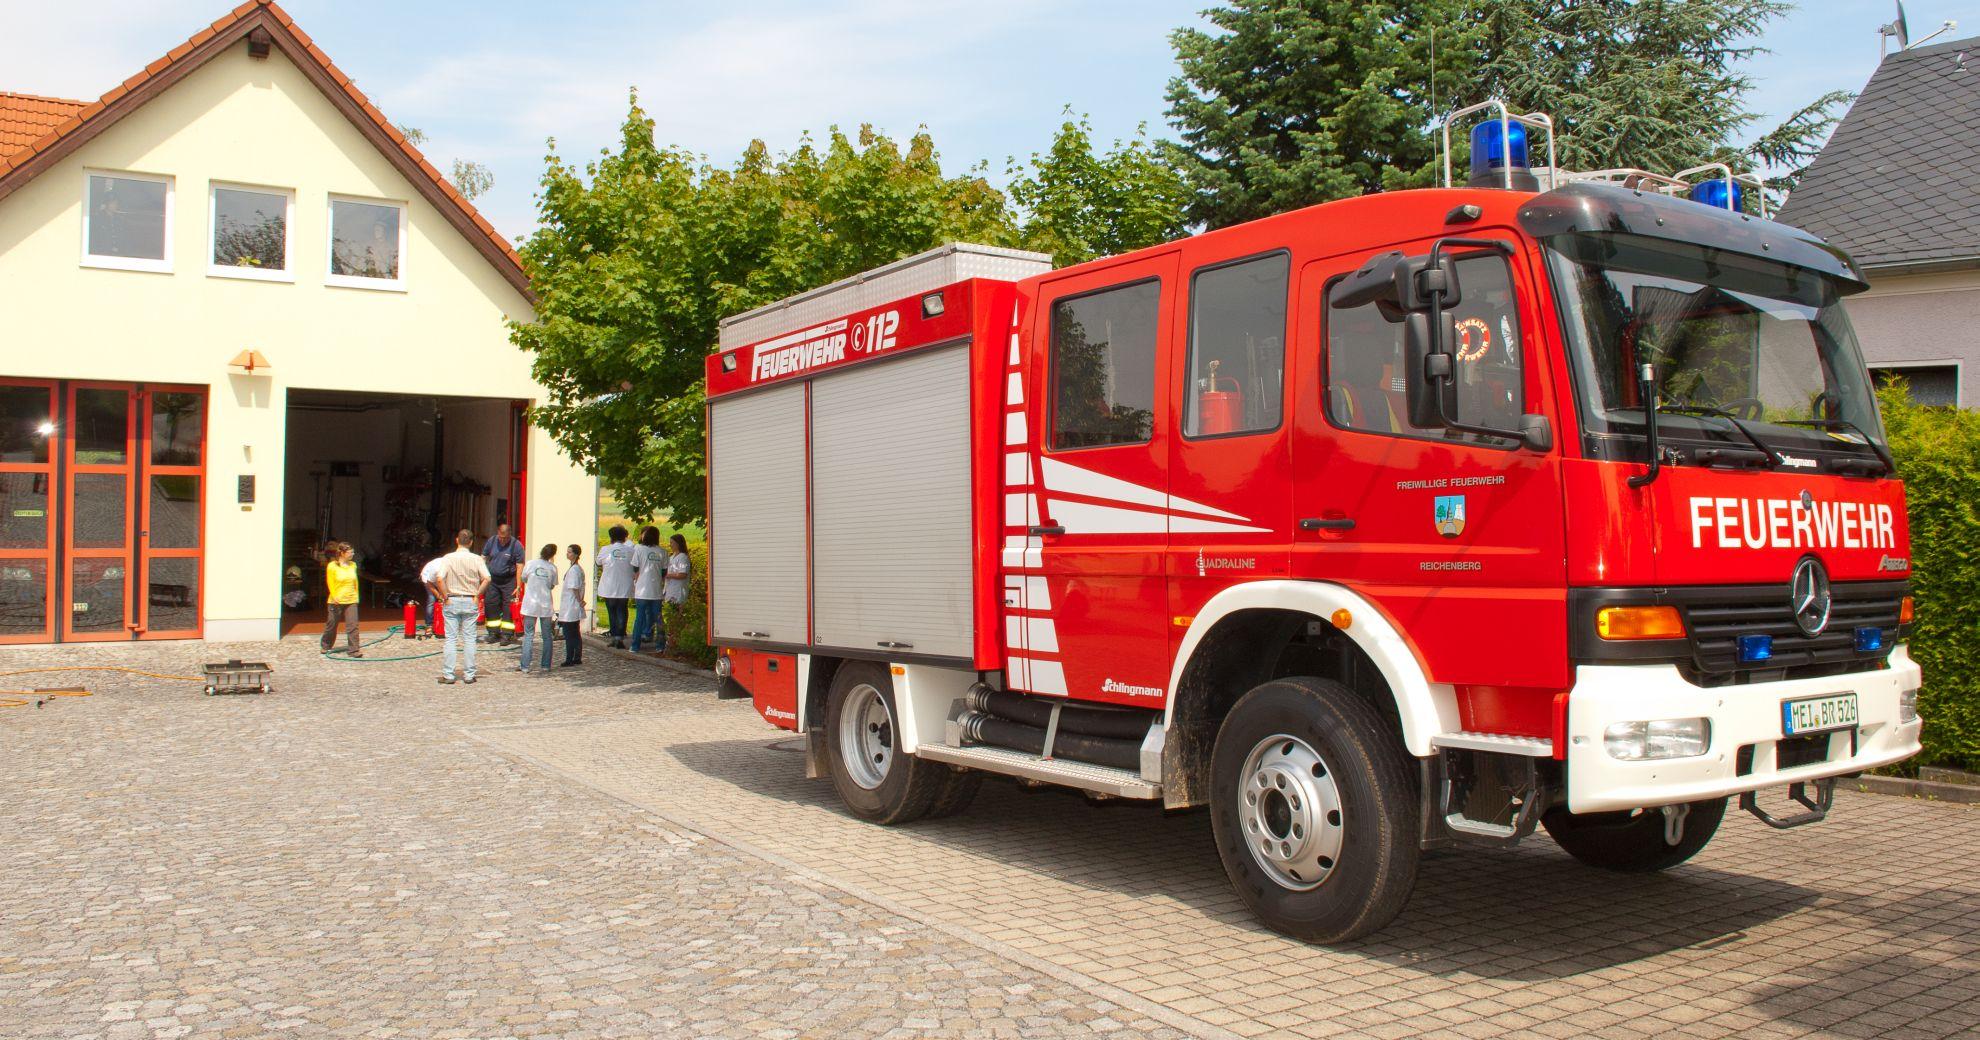 058_Calando Feuerwehr